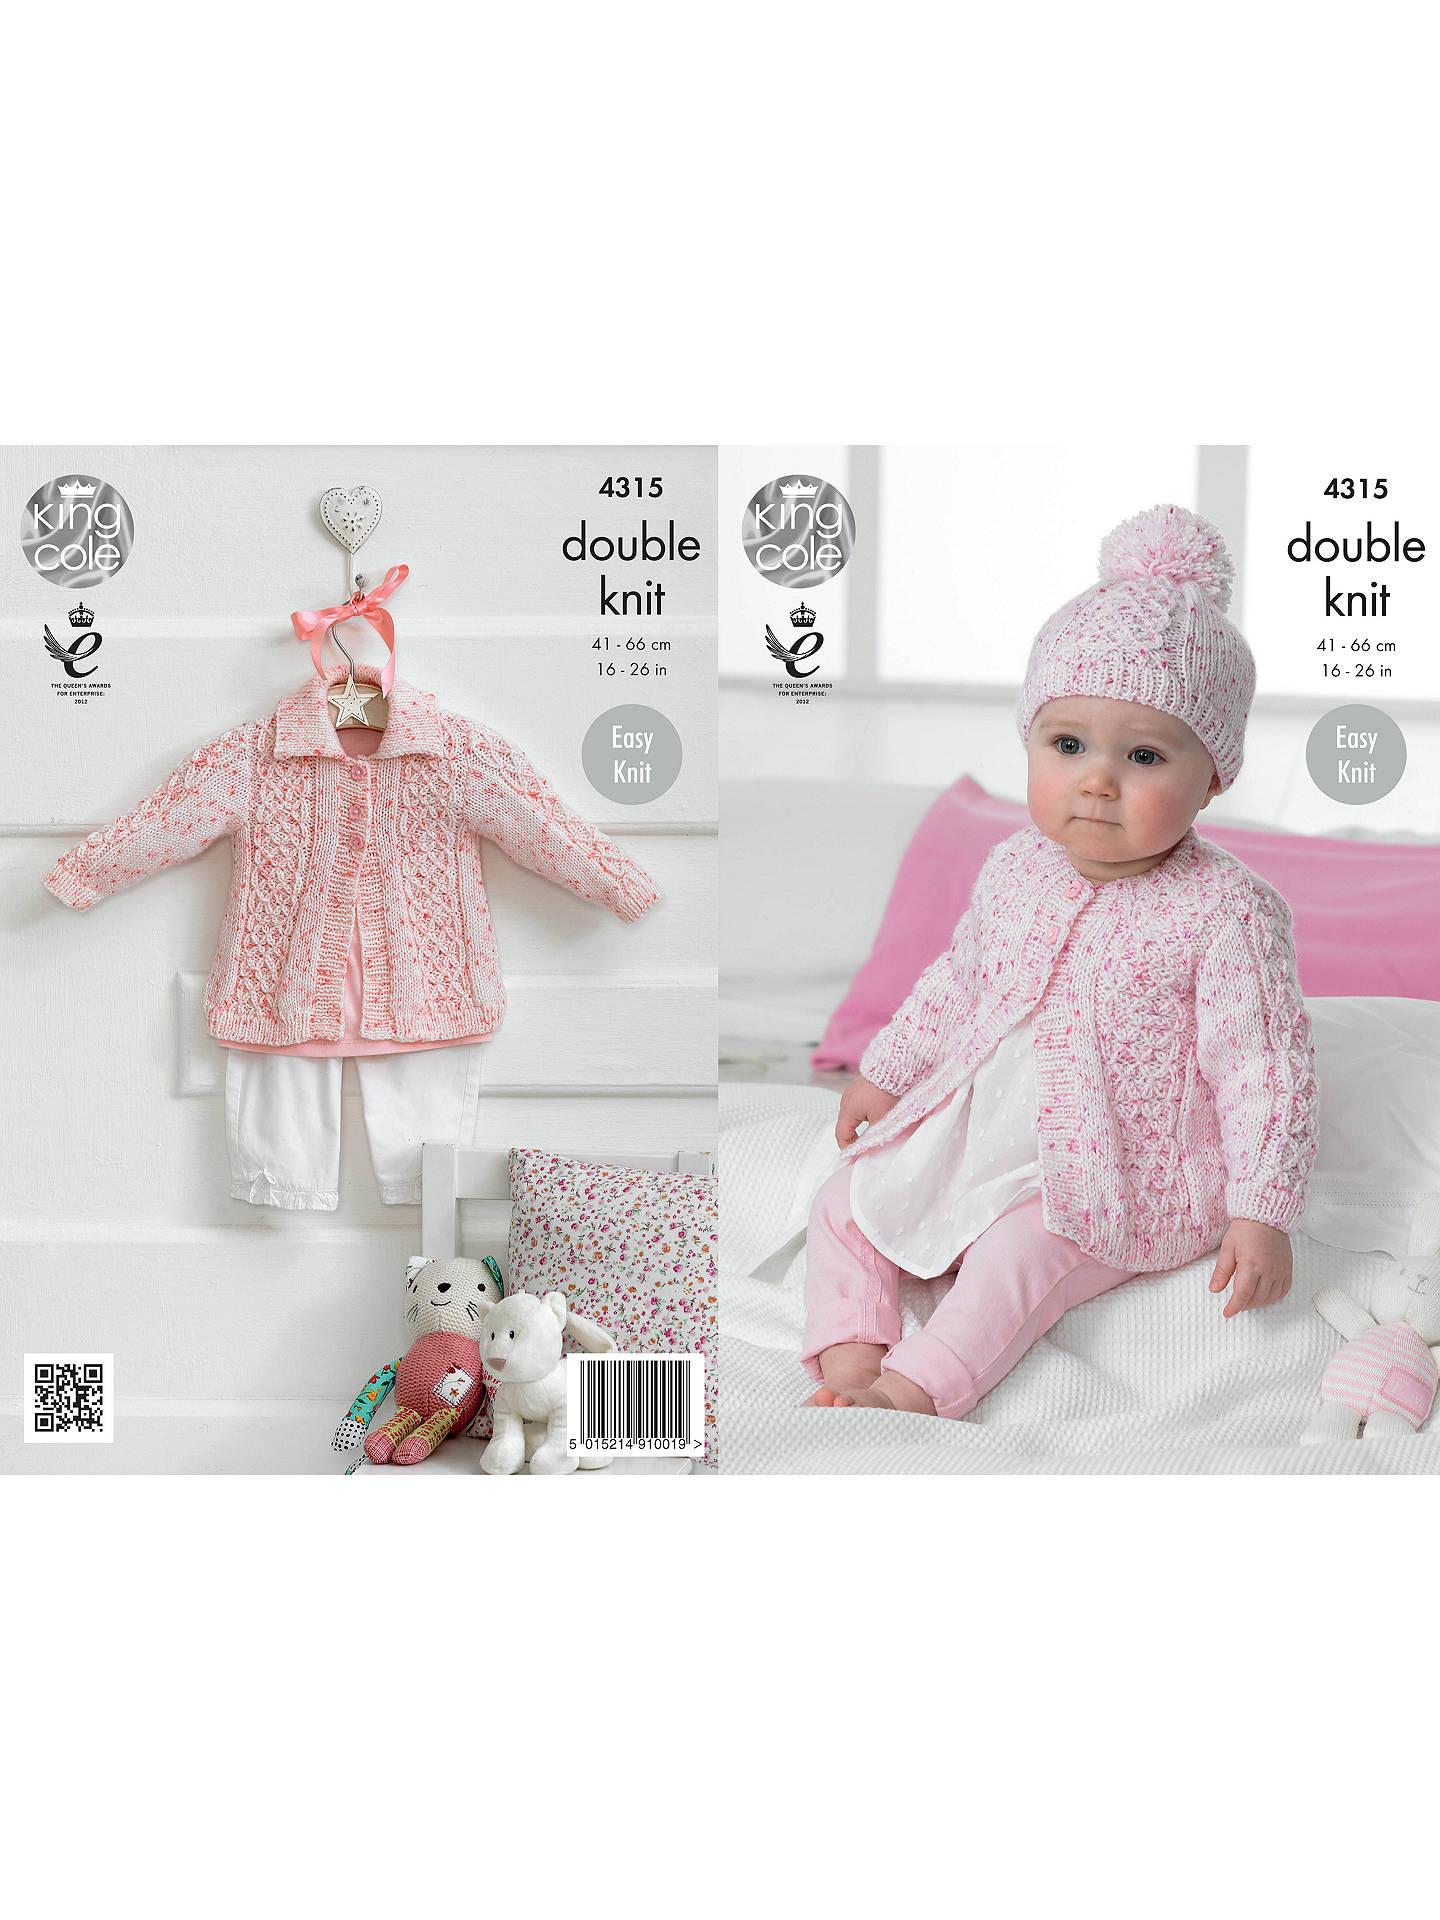 King Cole Smarty DK Baby Cardigan Knitting Pattern, 4315 ...